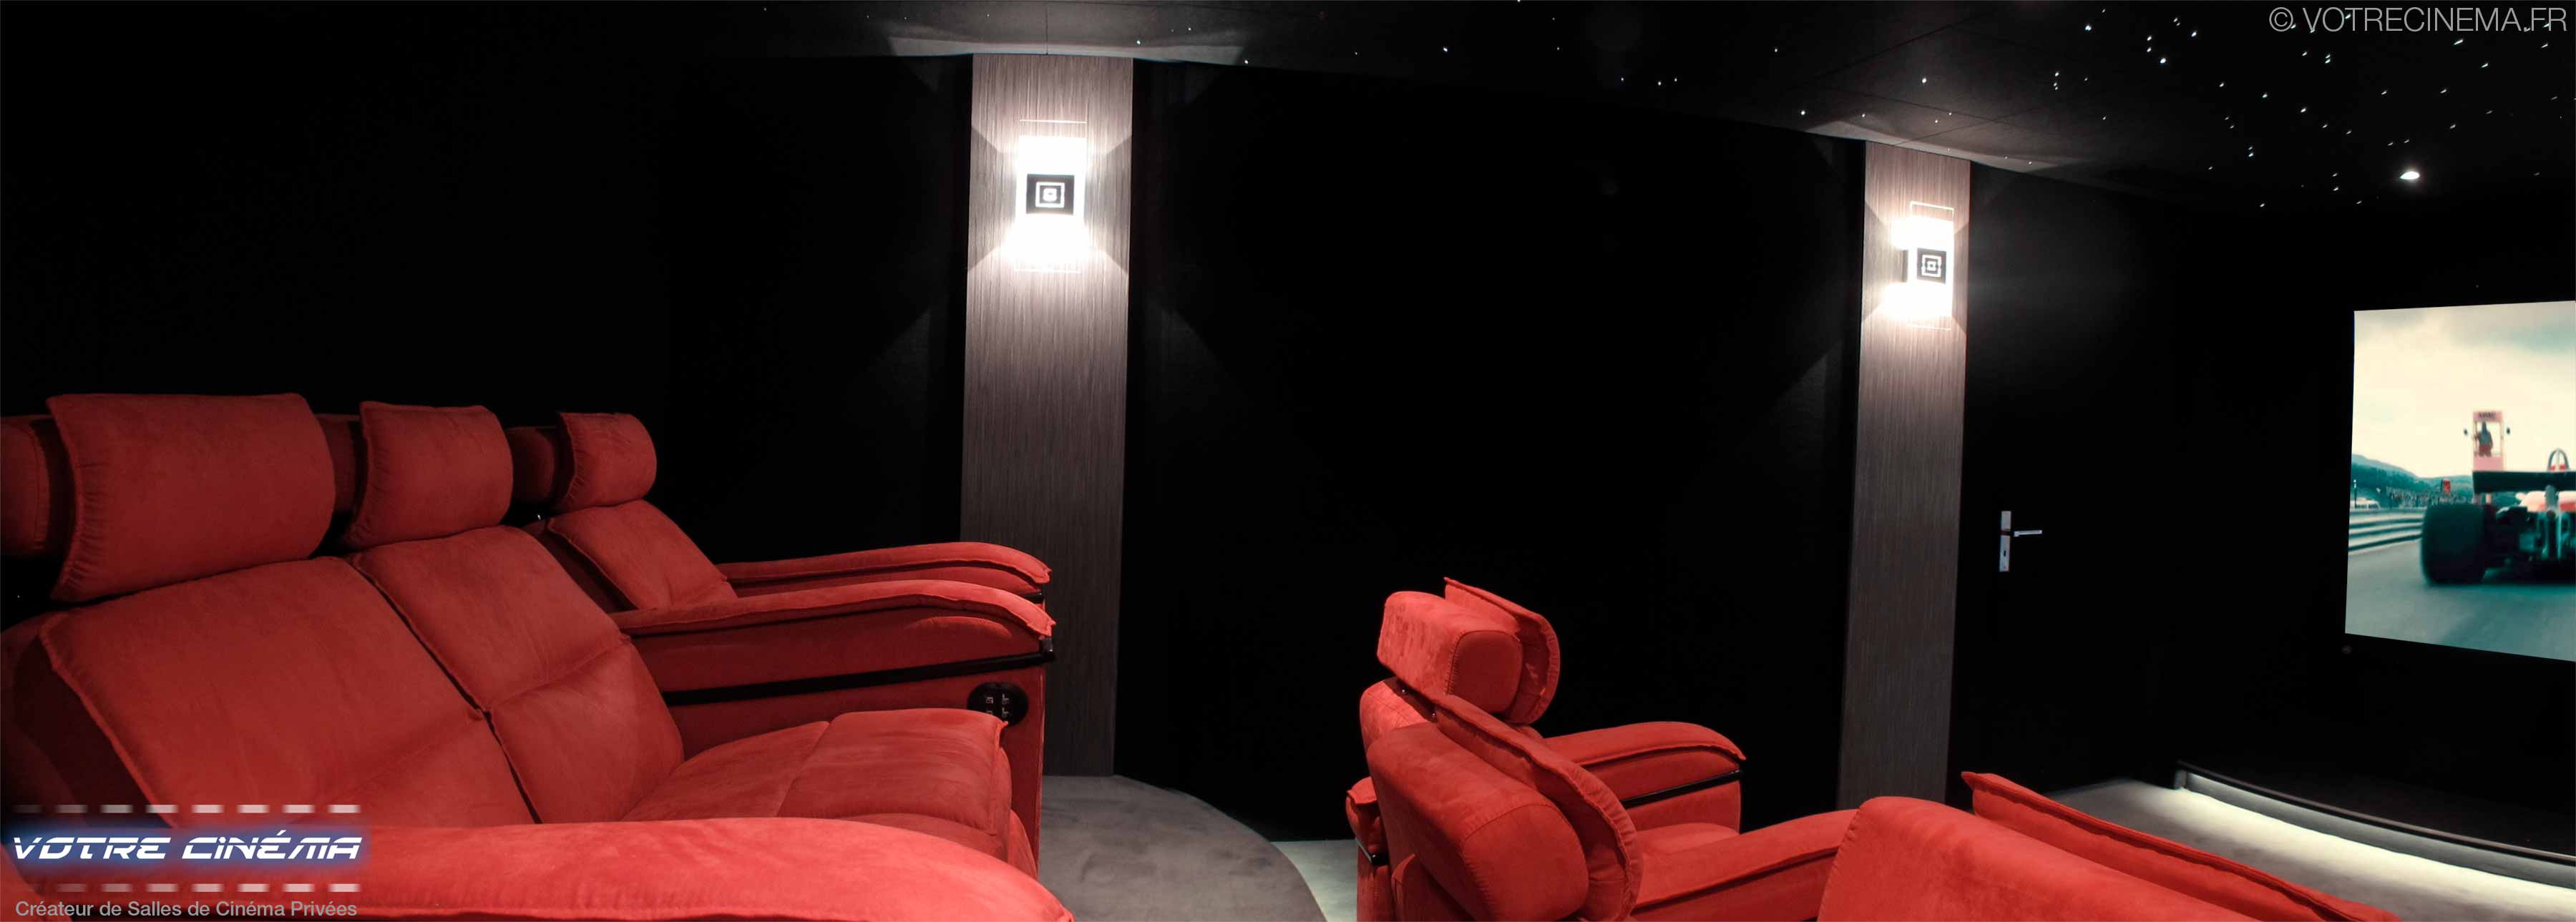 home cinéma privé salon de provence